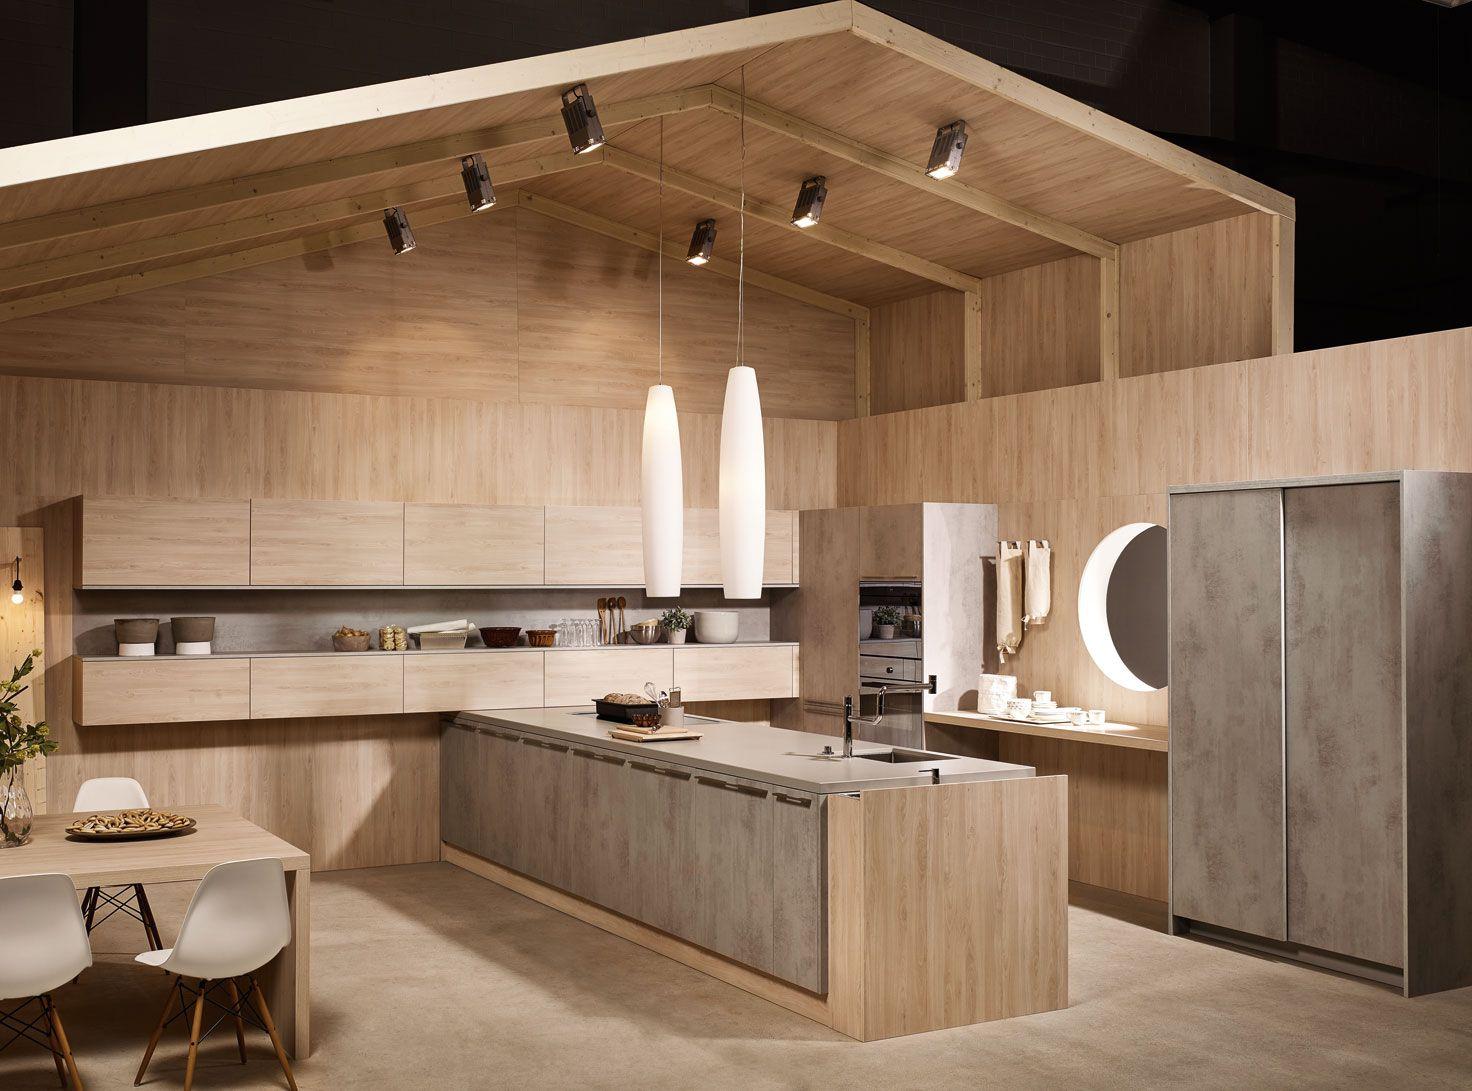 KH Küche: Beton Grau + Fjord Buche Natur / KH Kitchen: Concrete Grey +